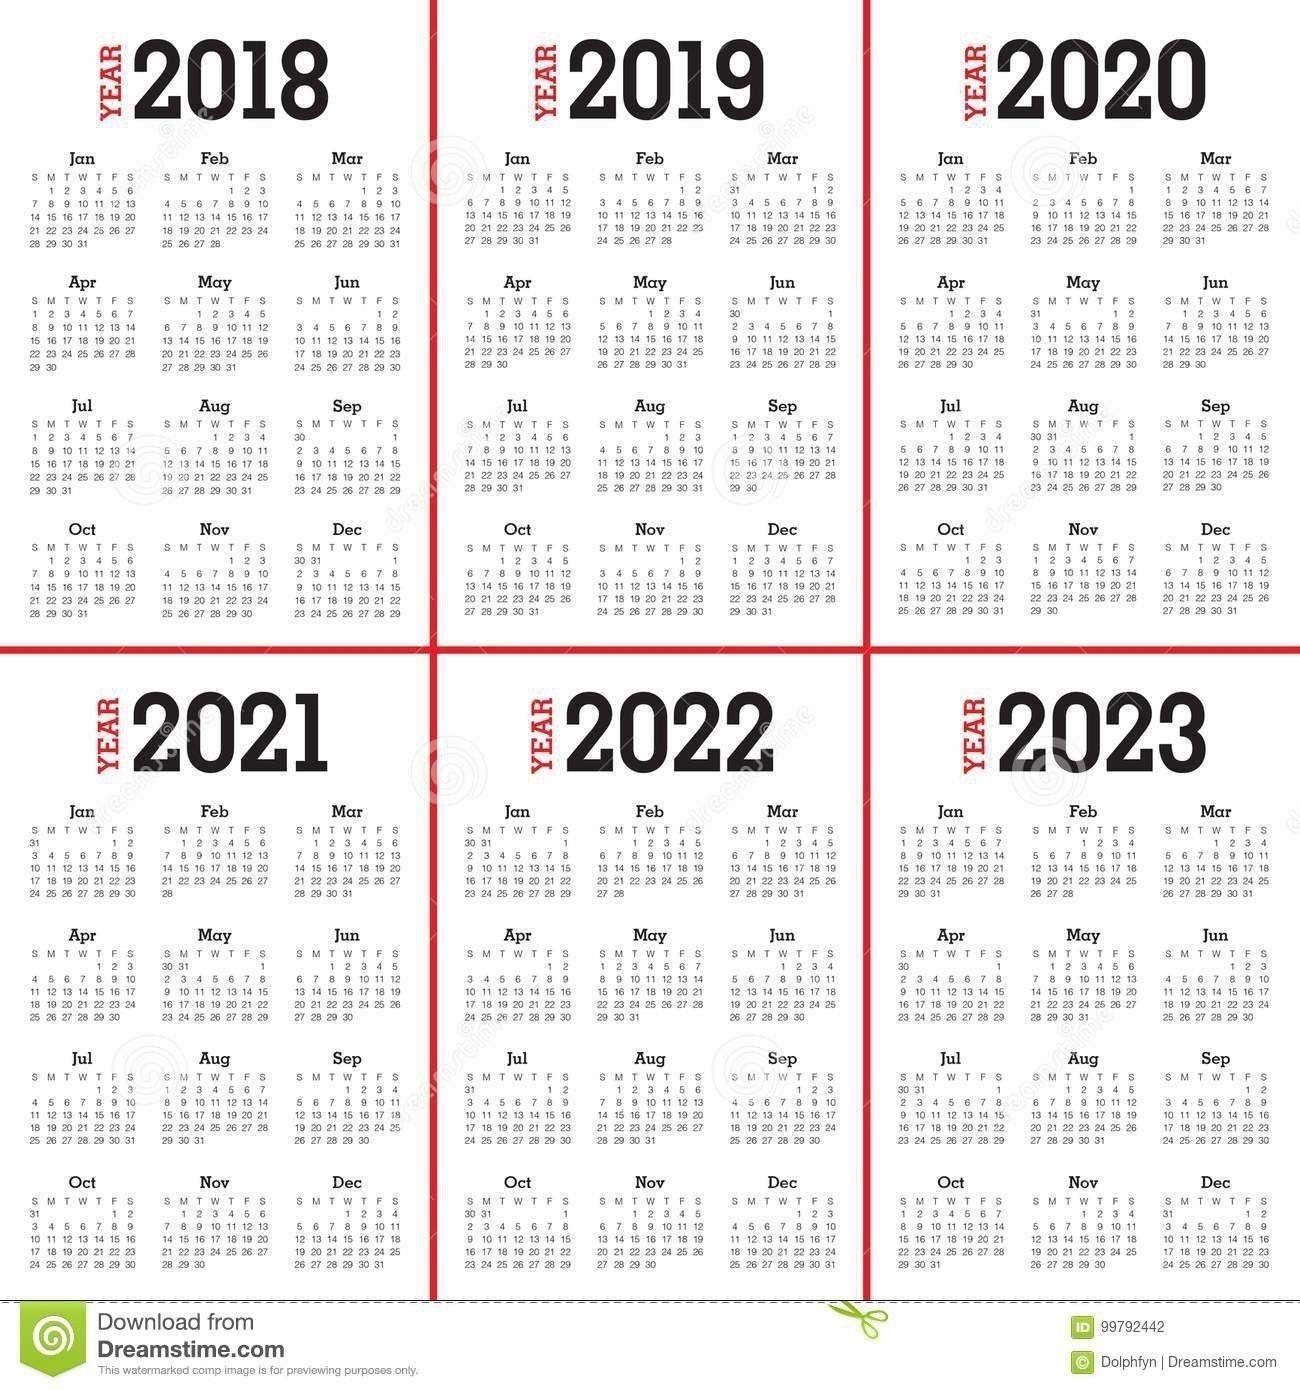 3 Year Calendar 2021 To 2023 Di 2020 | Stiker regarding Three Year Printable Calendar 2021 To 2023